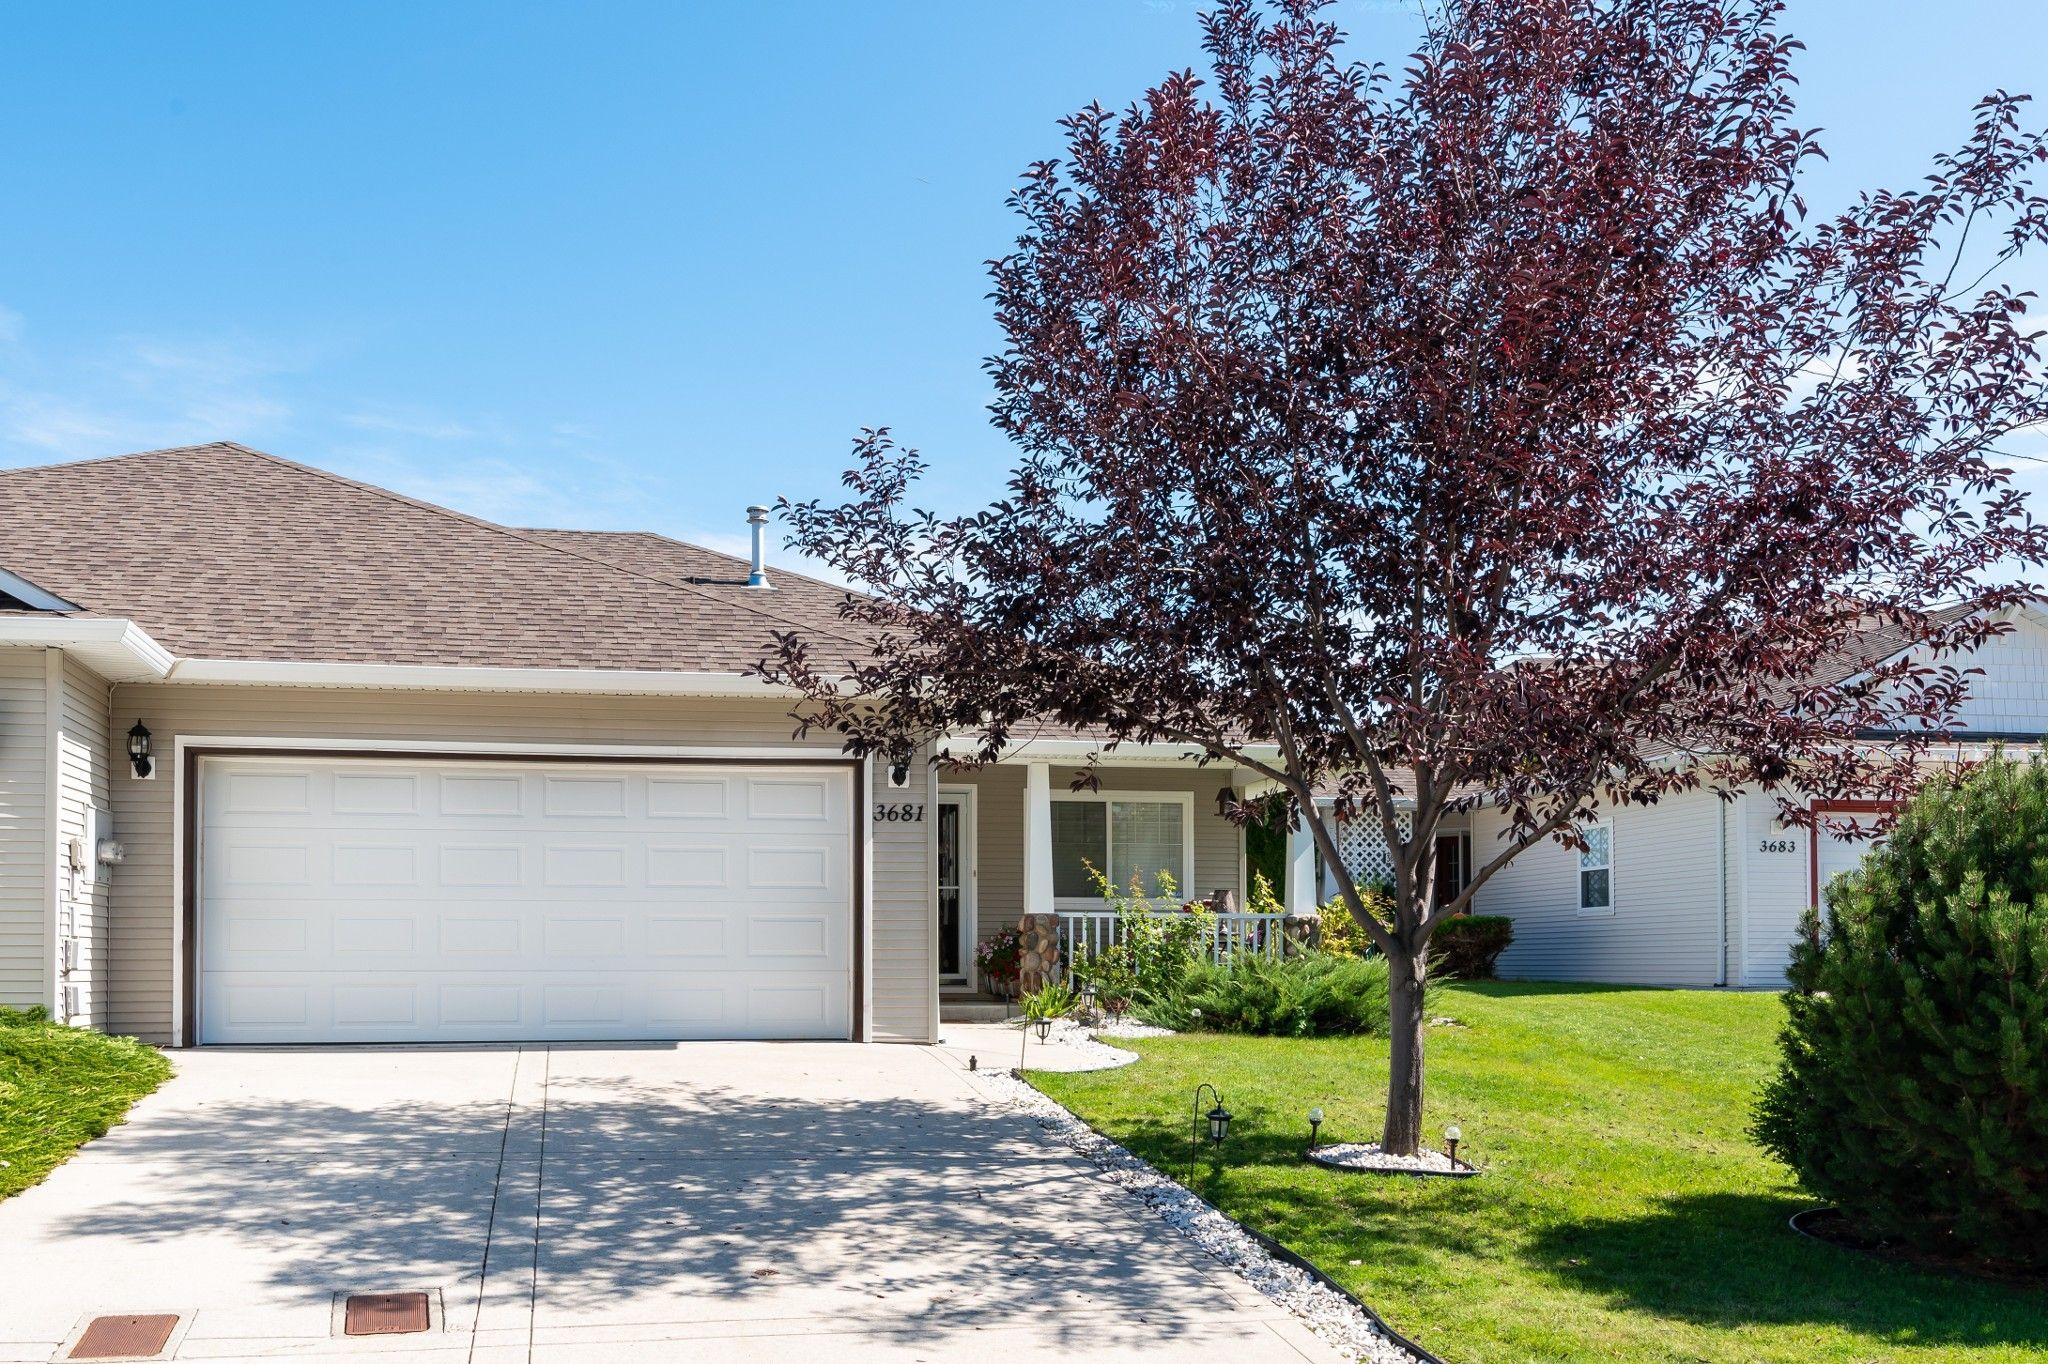 Main Photo: 3681 Morningside Drive: West Kelowna Duplex for sale (South Okanagan)  : MLS®# 10191317